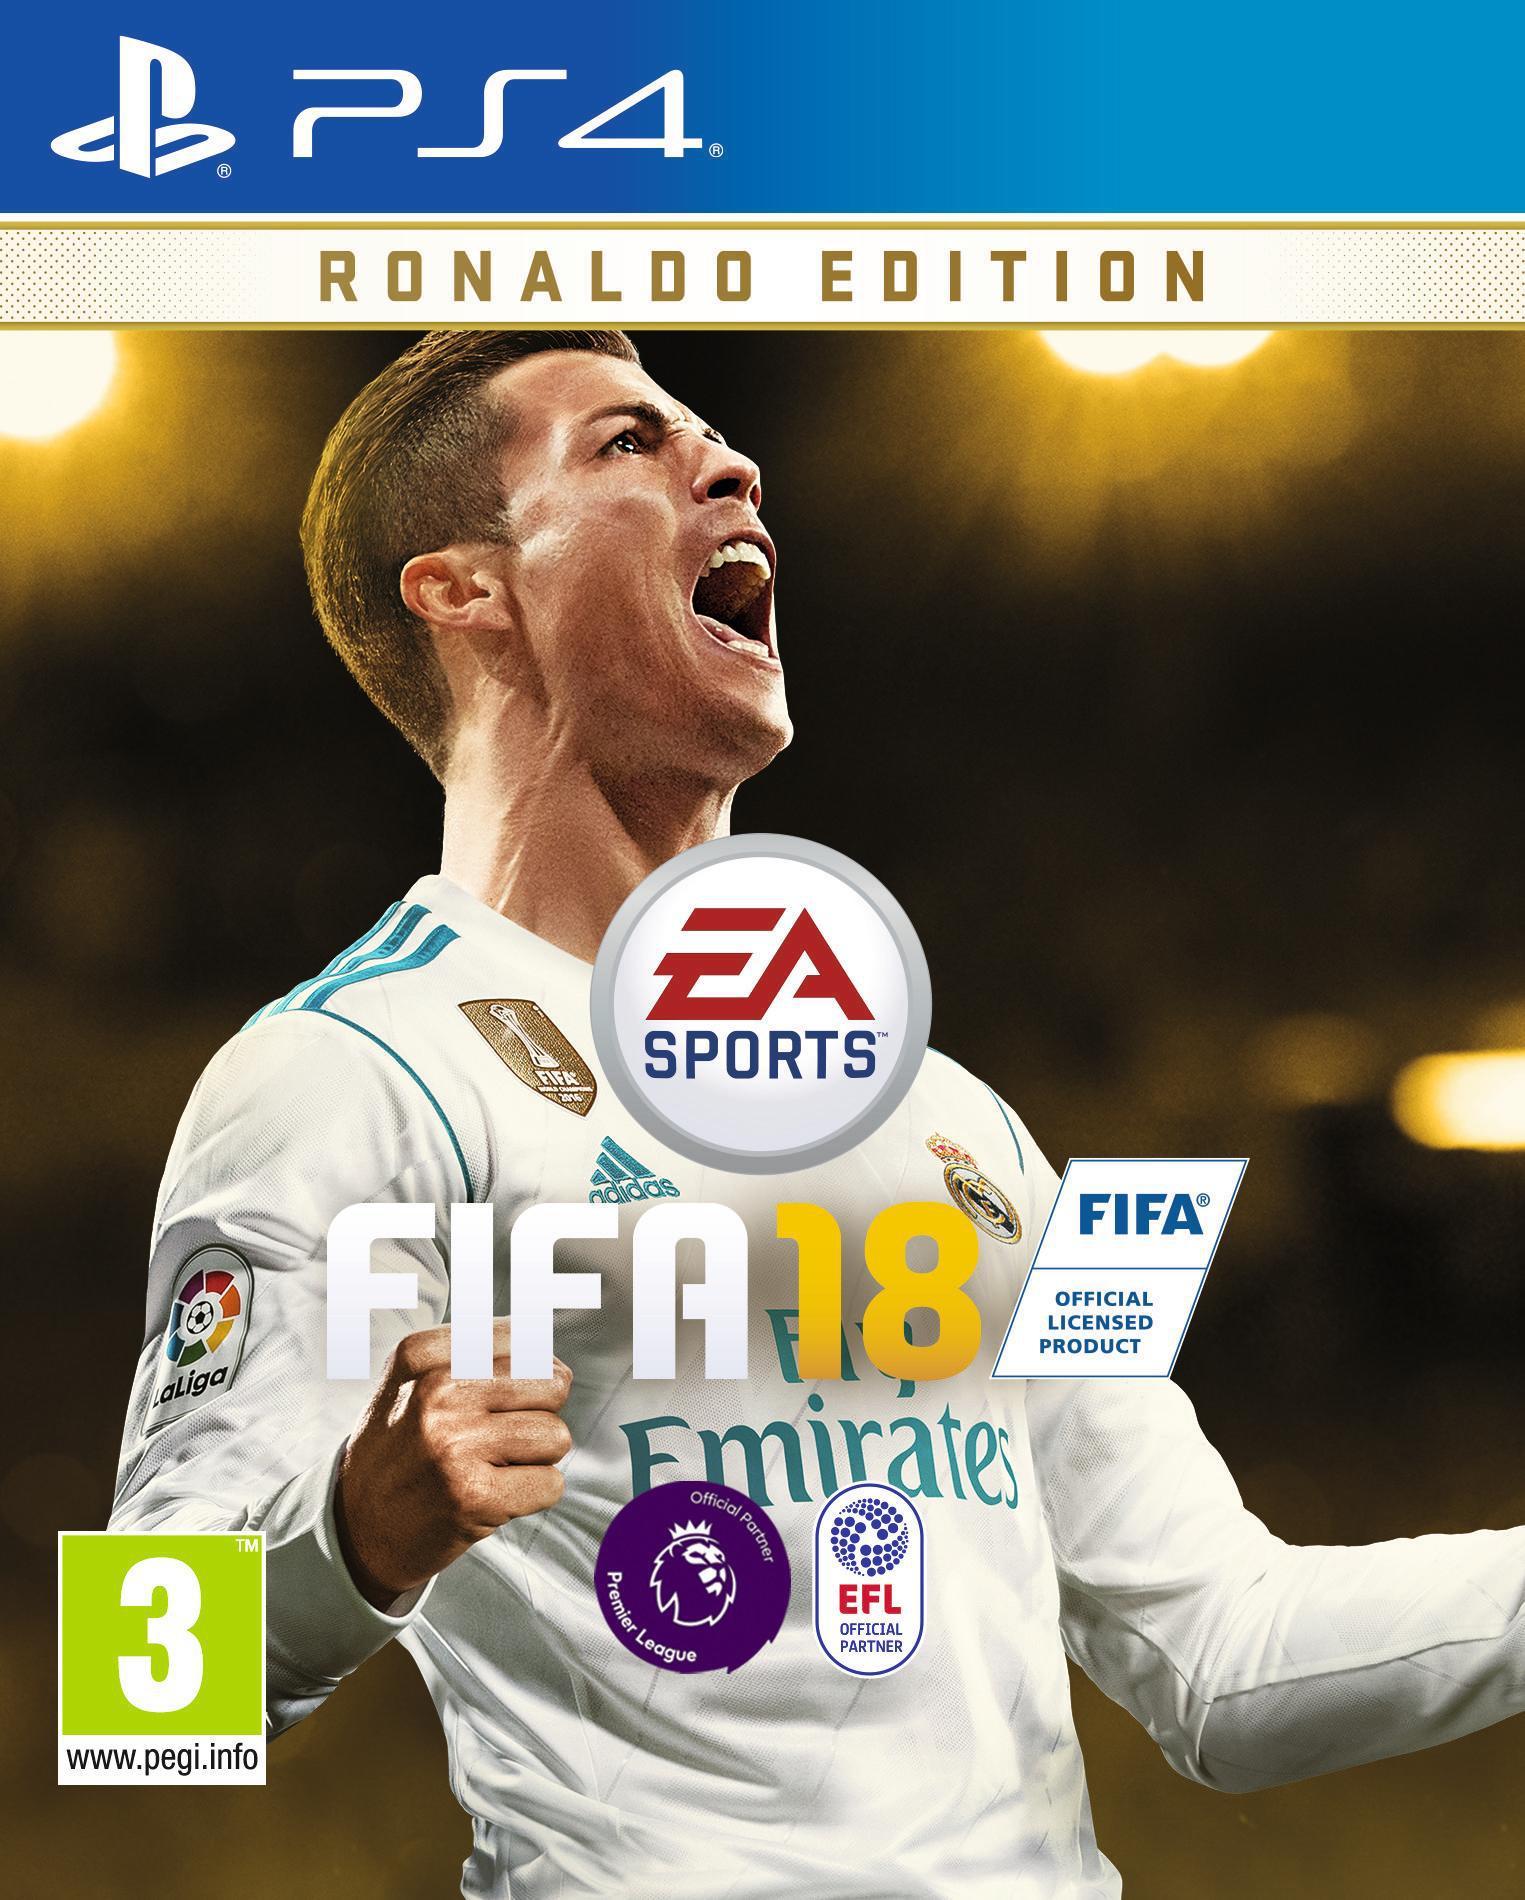 fifa-19-ronaldo-juventus_11tt65do22tn81bgb91xjorf0n-300x169 Download Fifa 19 for iOS iPhone